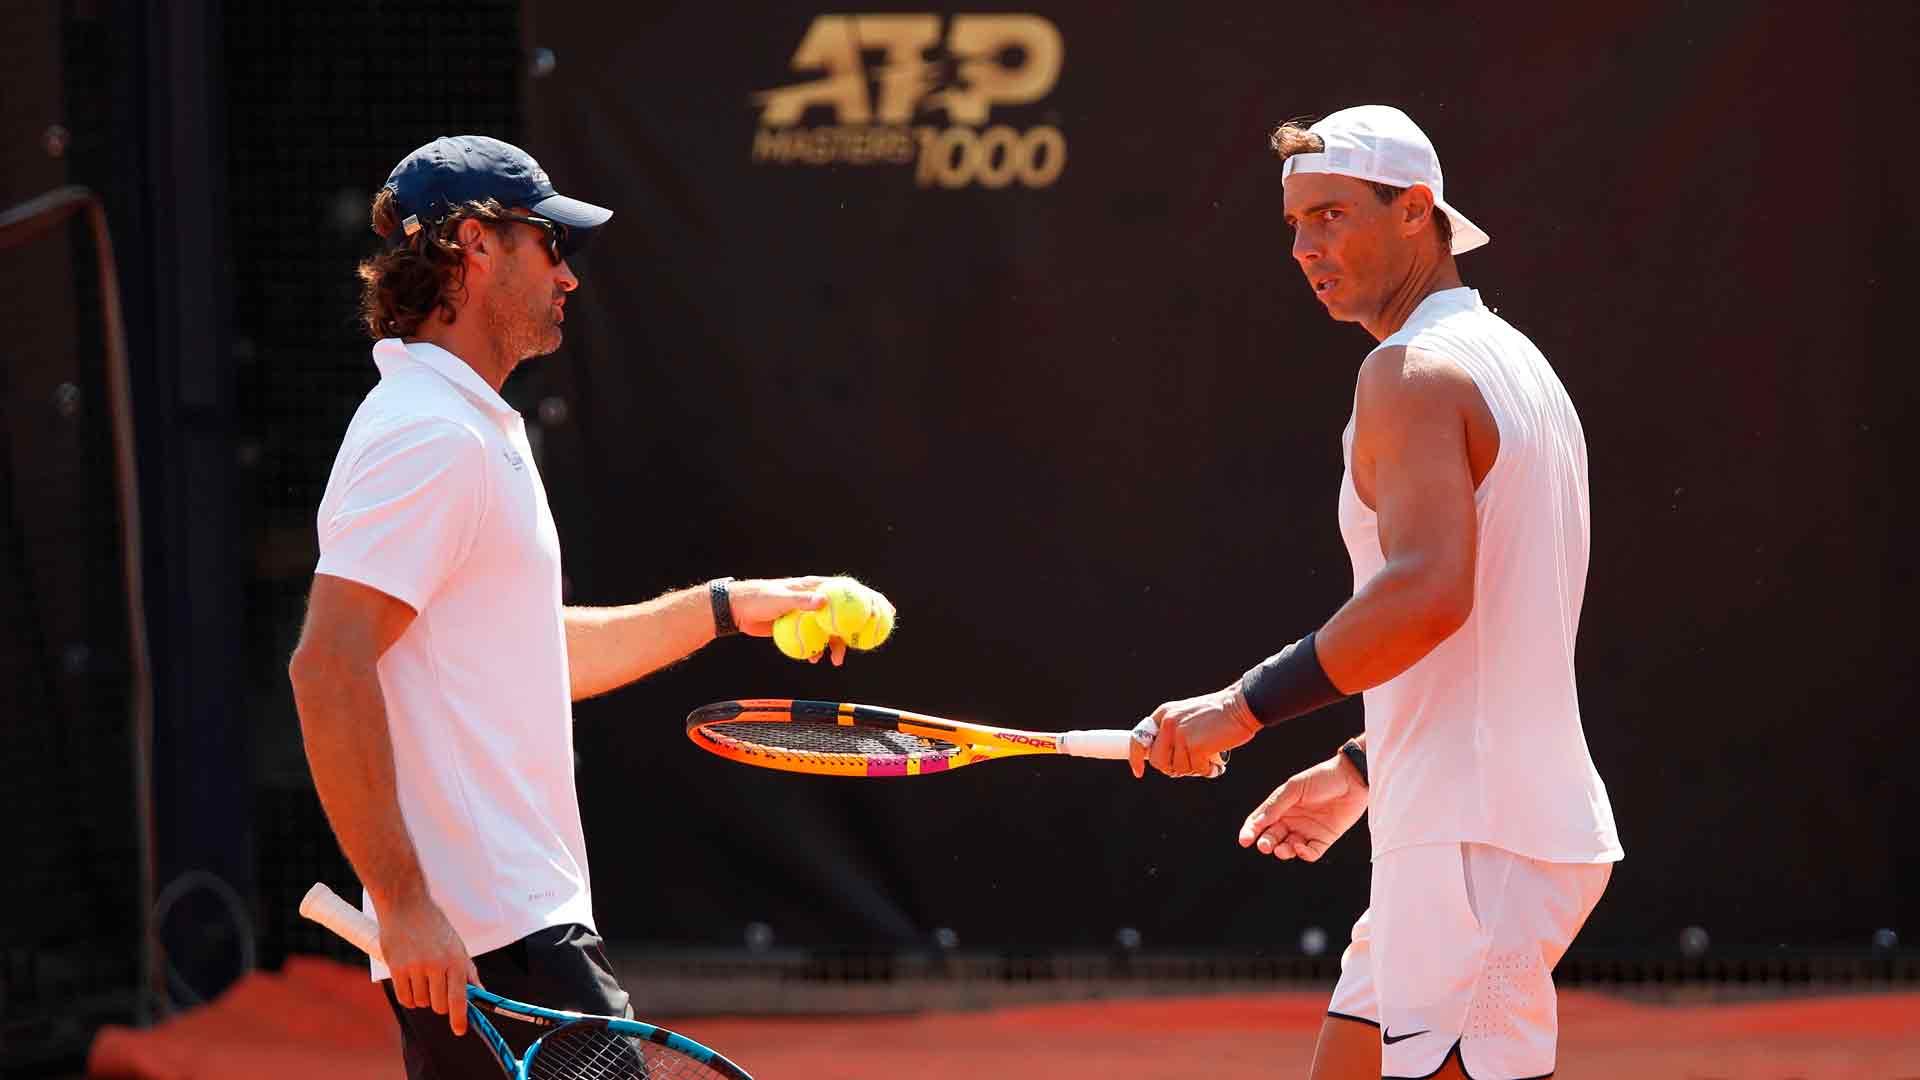 Rafael Nadal Excited For Atp Tour Return In Rome Atp Tour Tennis